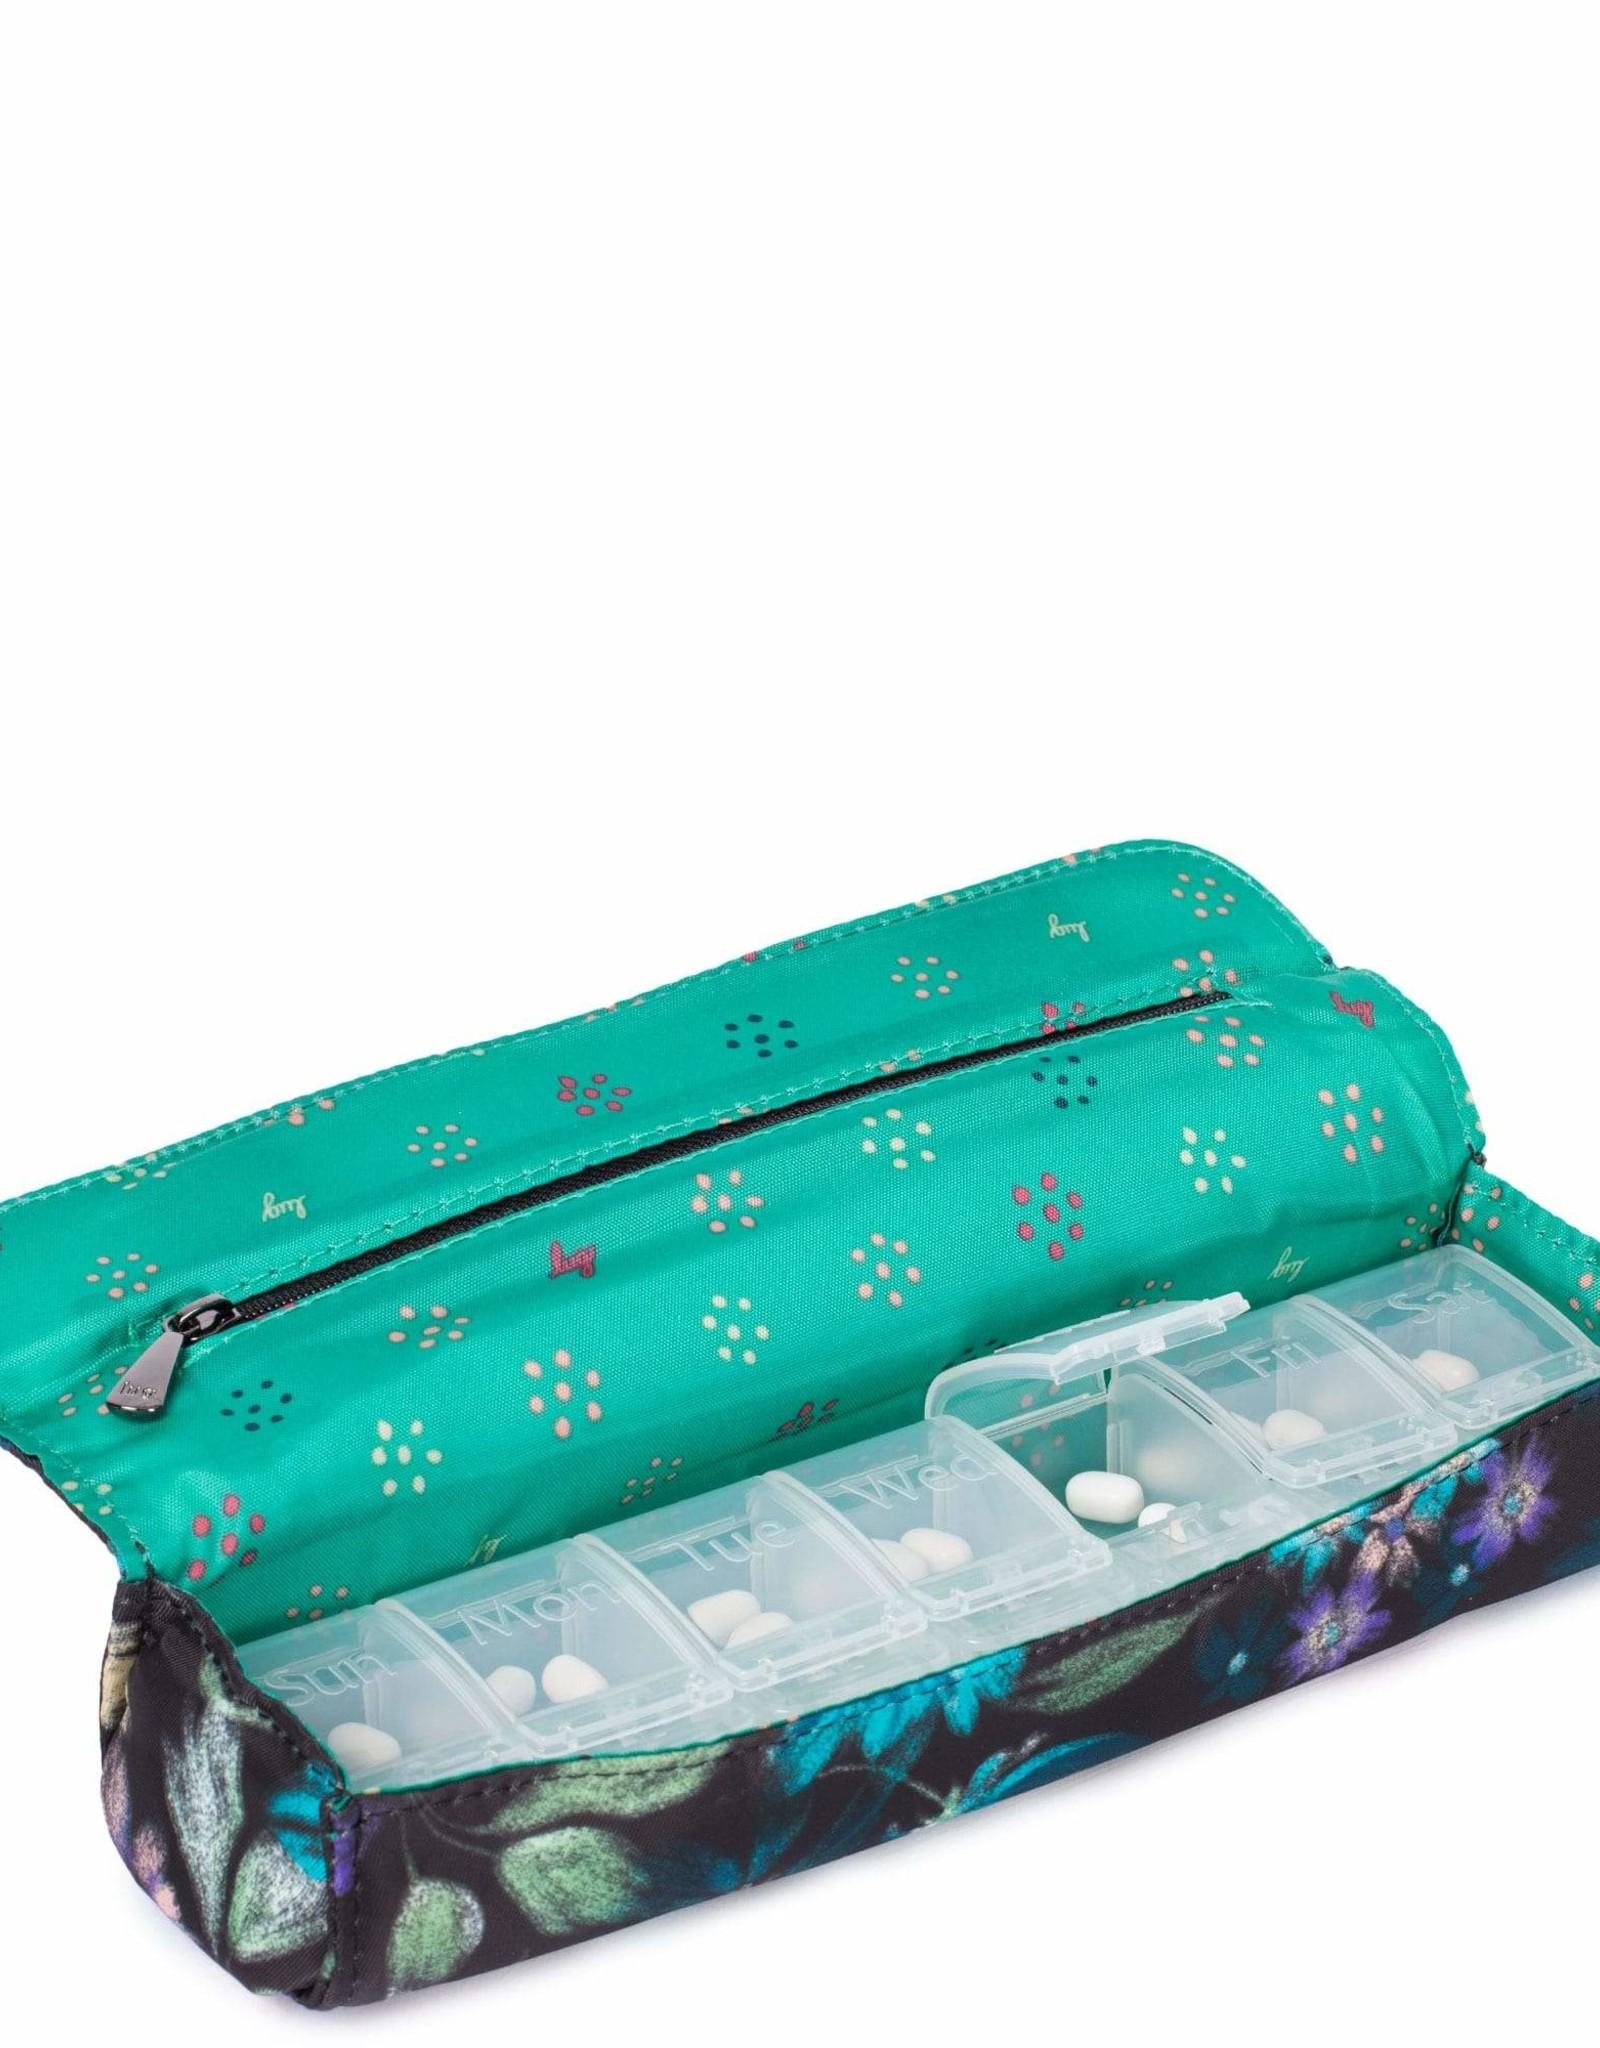 Lug Choo Choo Pill Box Case